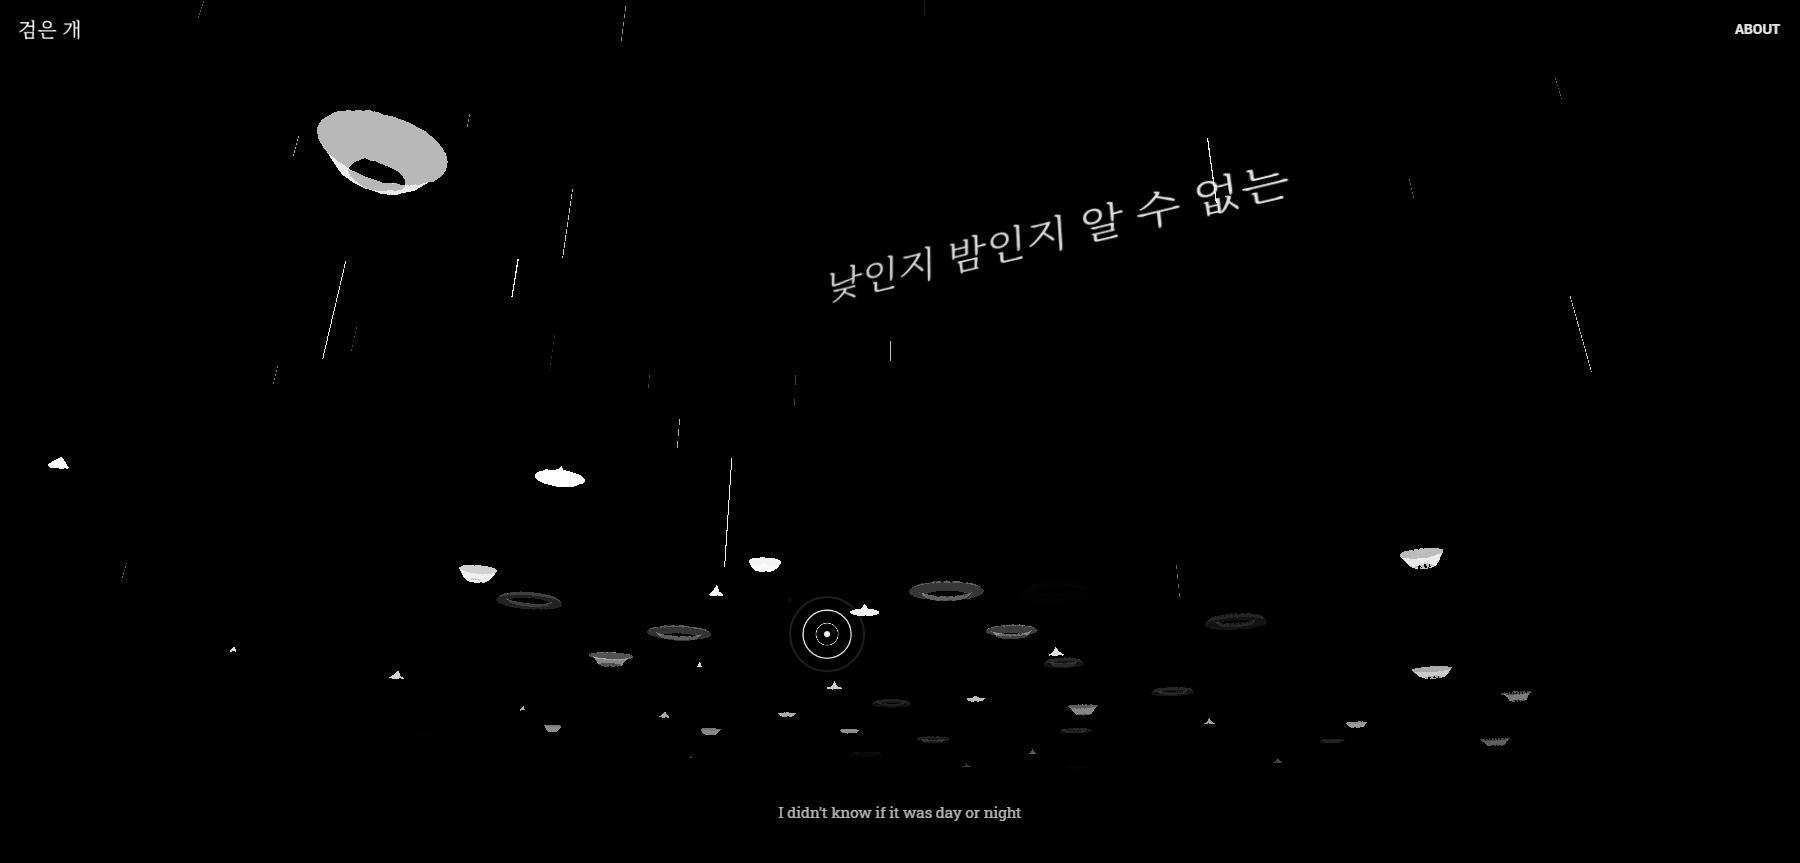 Black Dog - Website of the Day